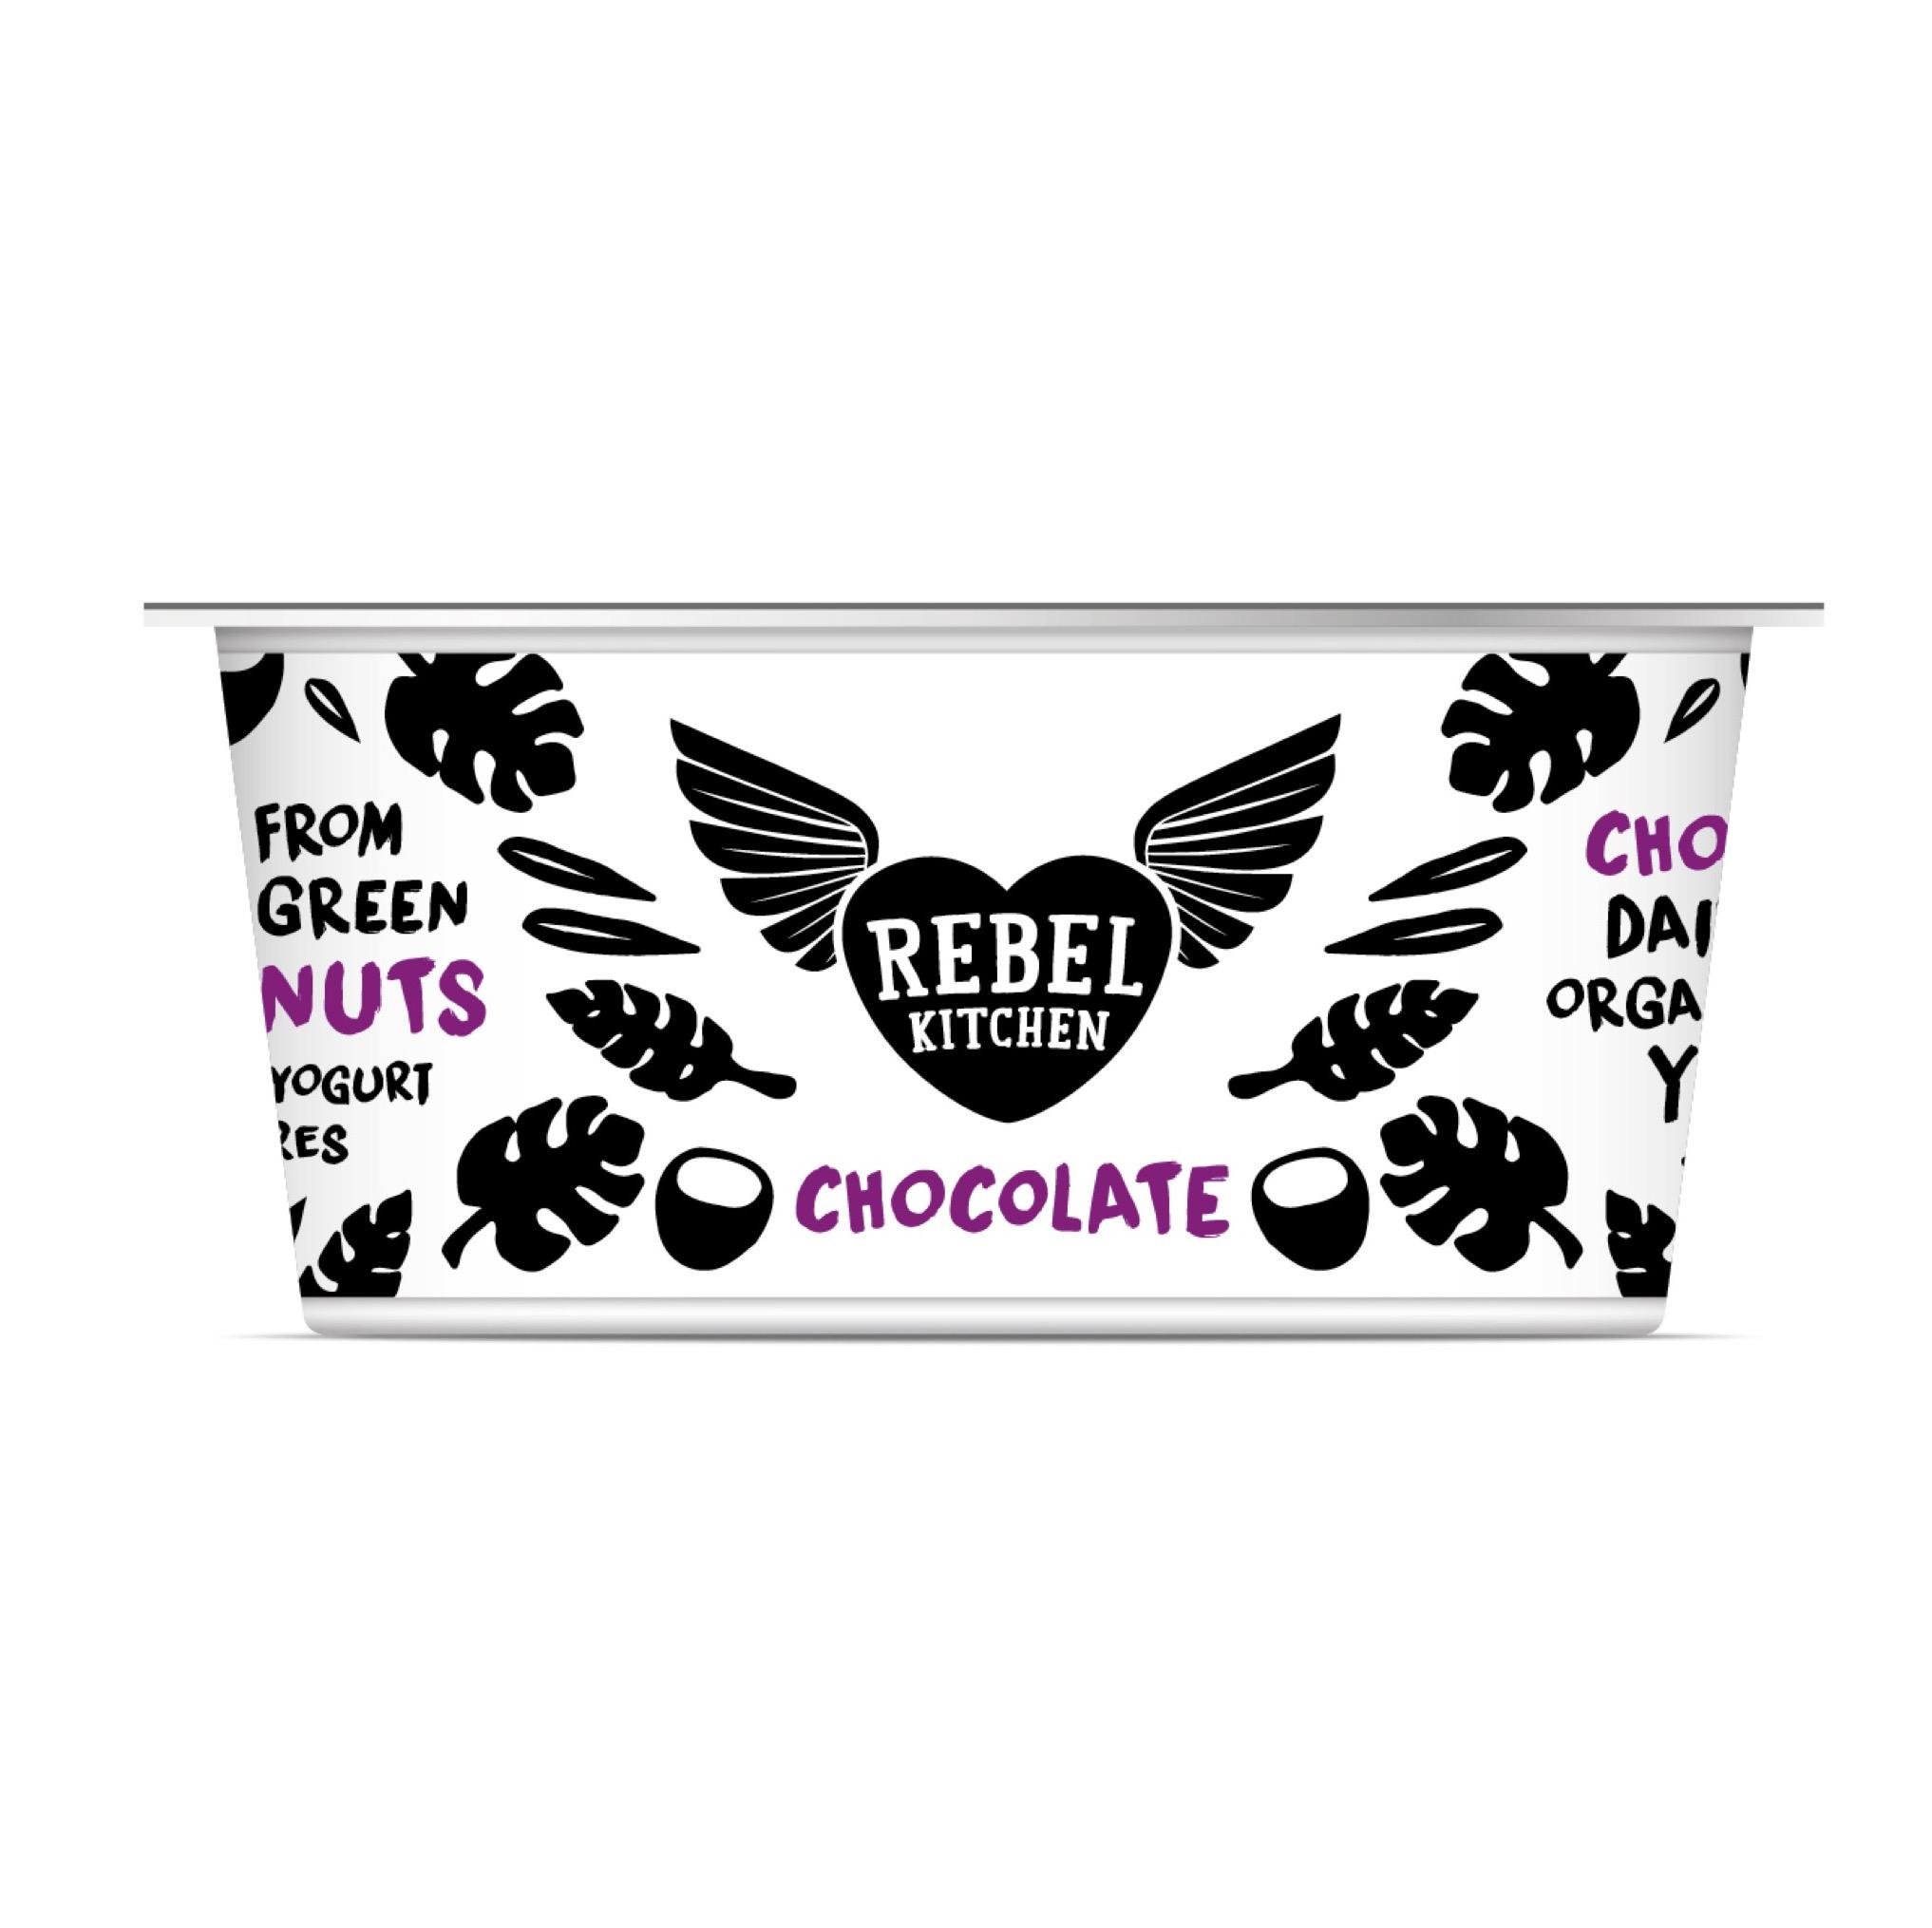 REBEL KITCHEN CHOCOLATE YOGURT